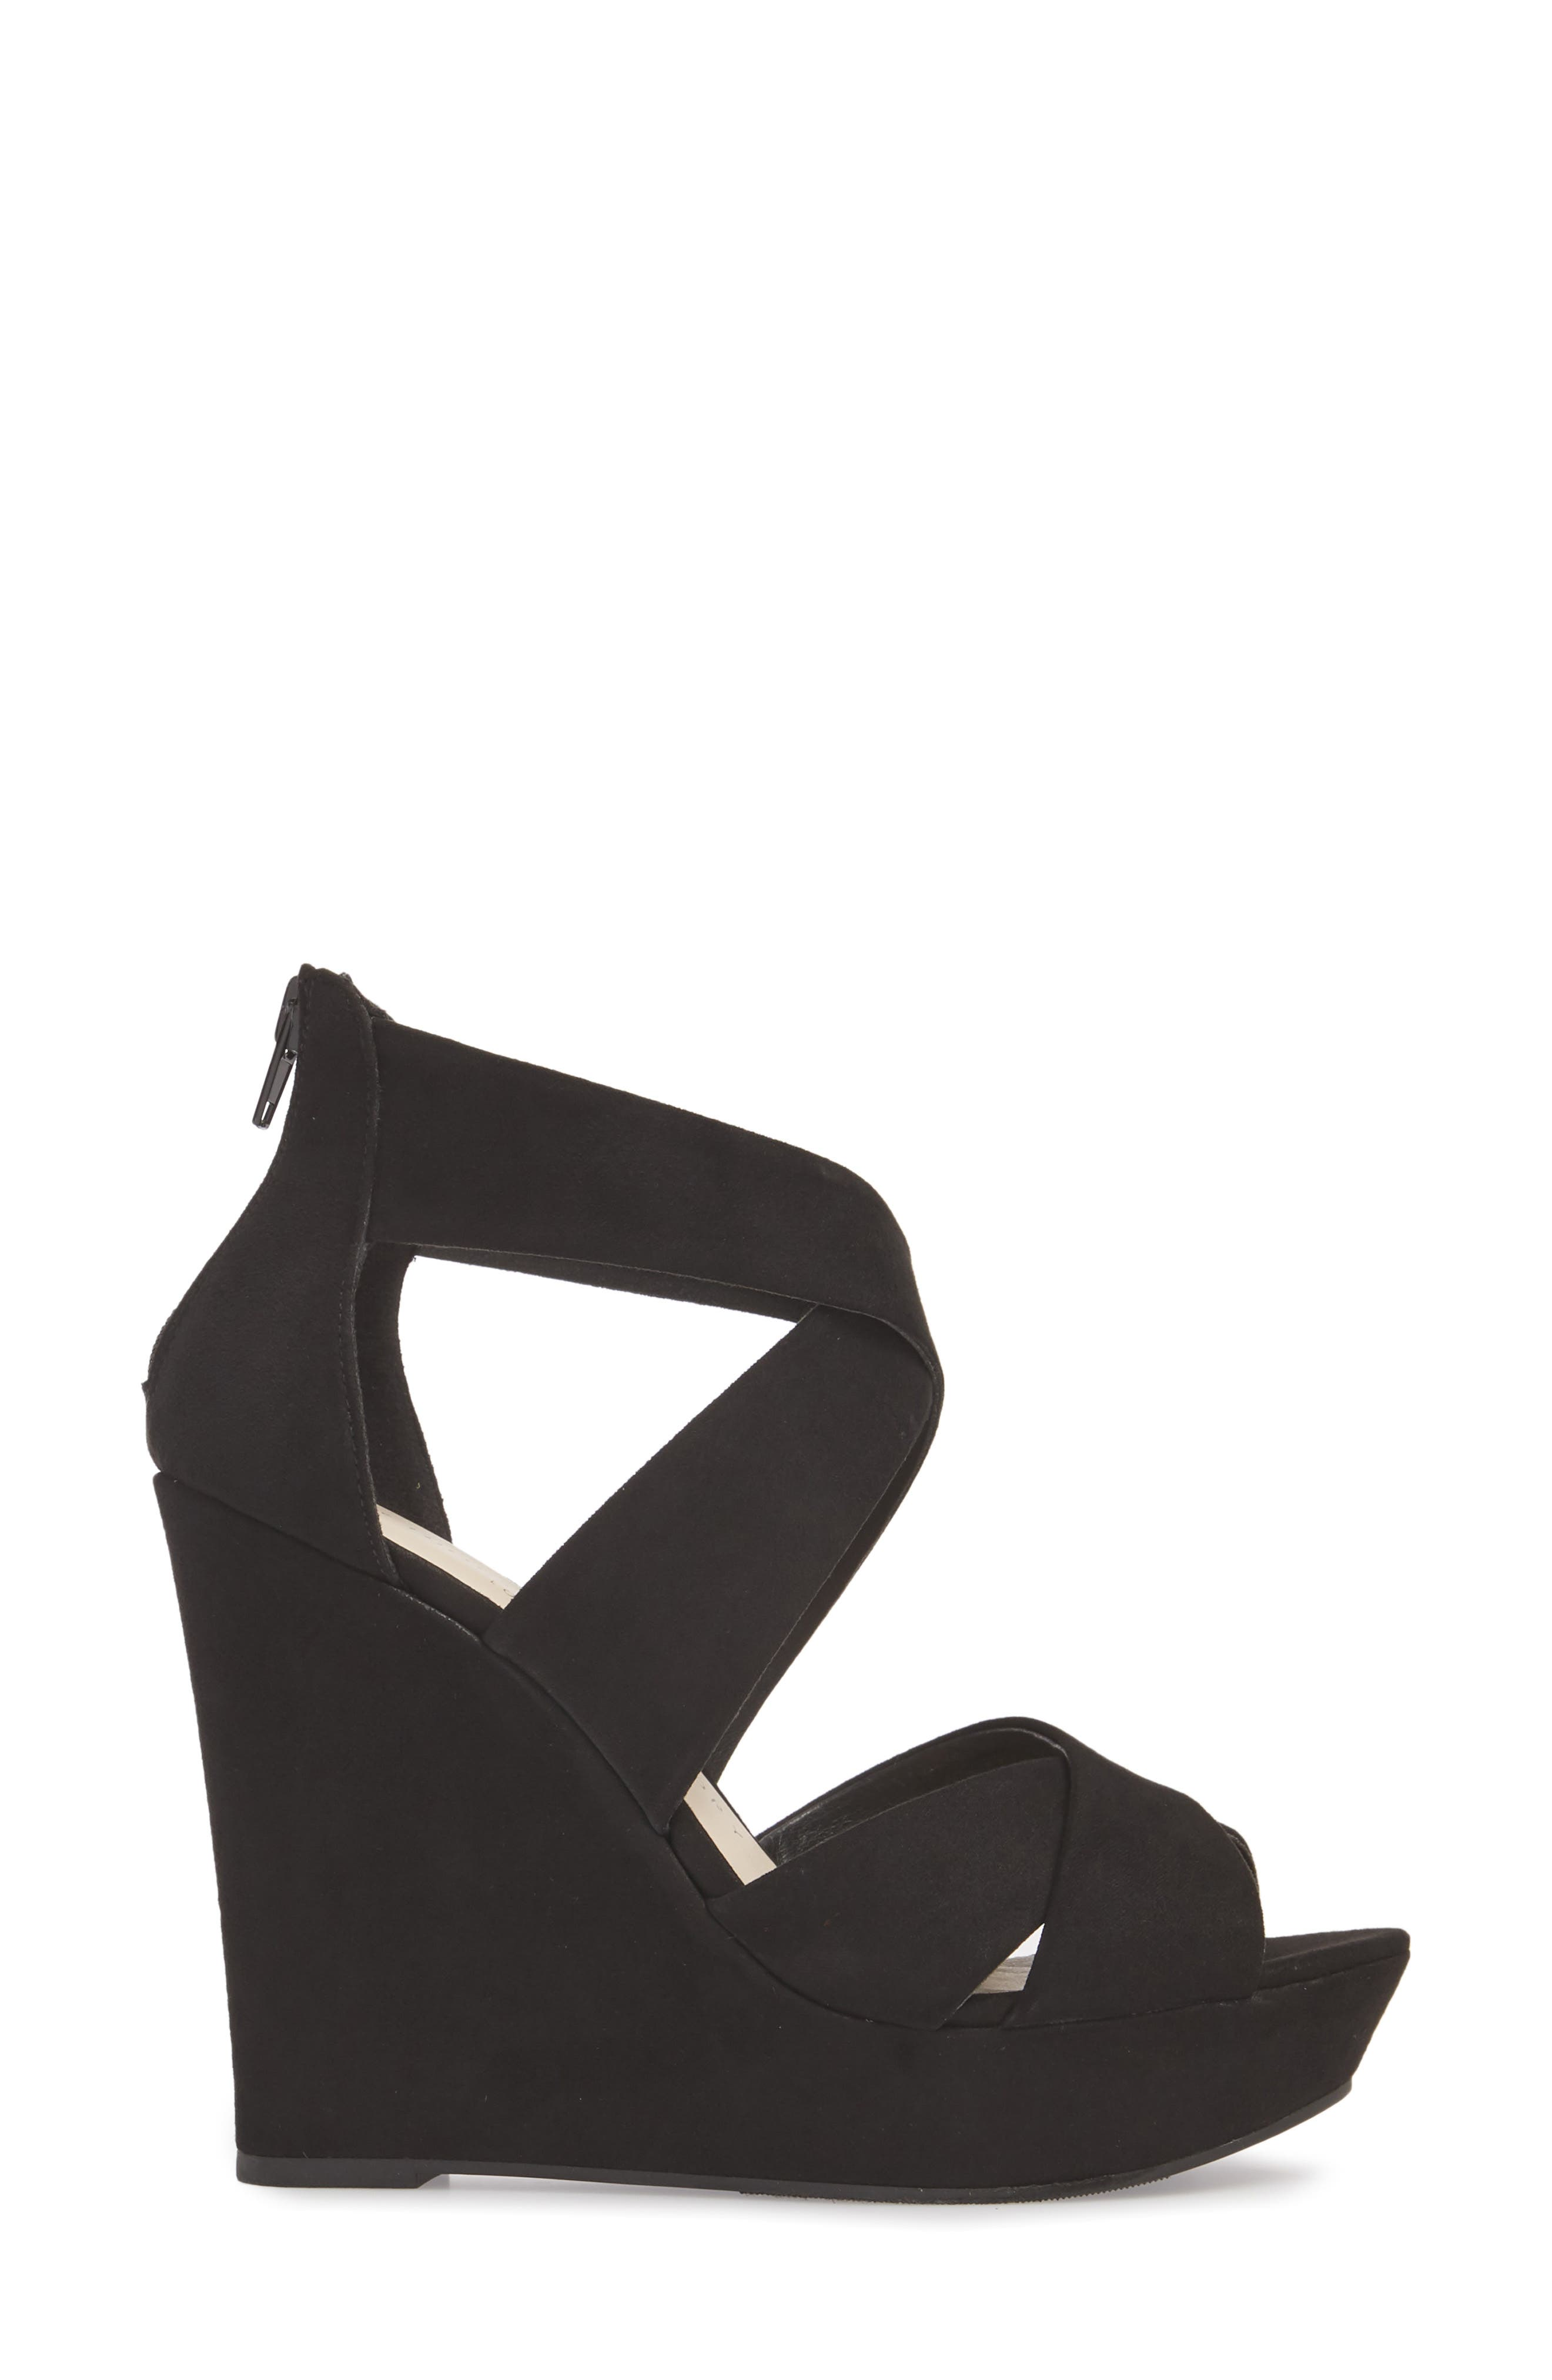 Milani Platform Wedge Sandal,                             Alternate thumbnail 3, color,                             BLACK